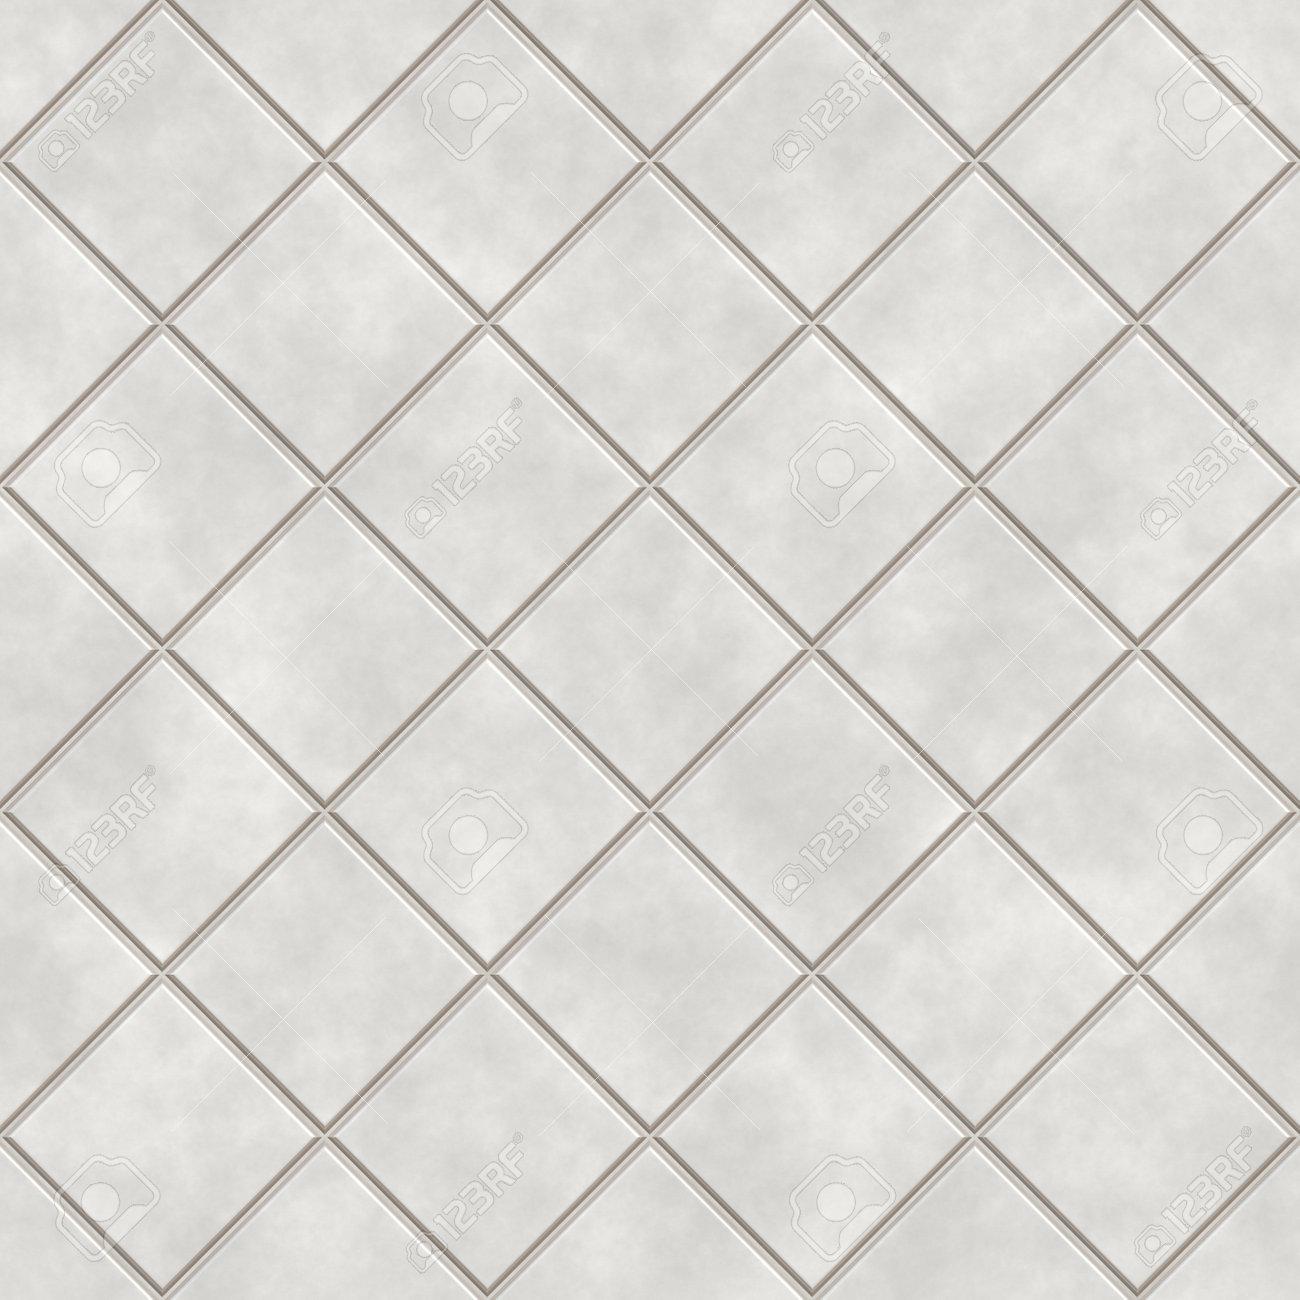 pattern of seamless ceramic